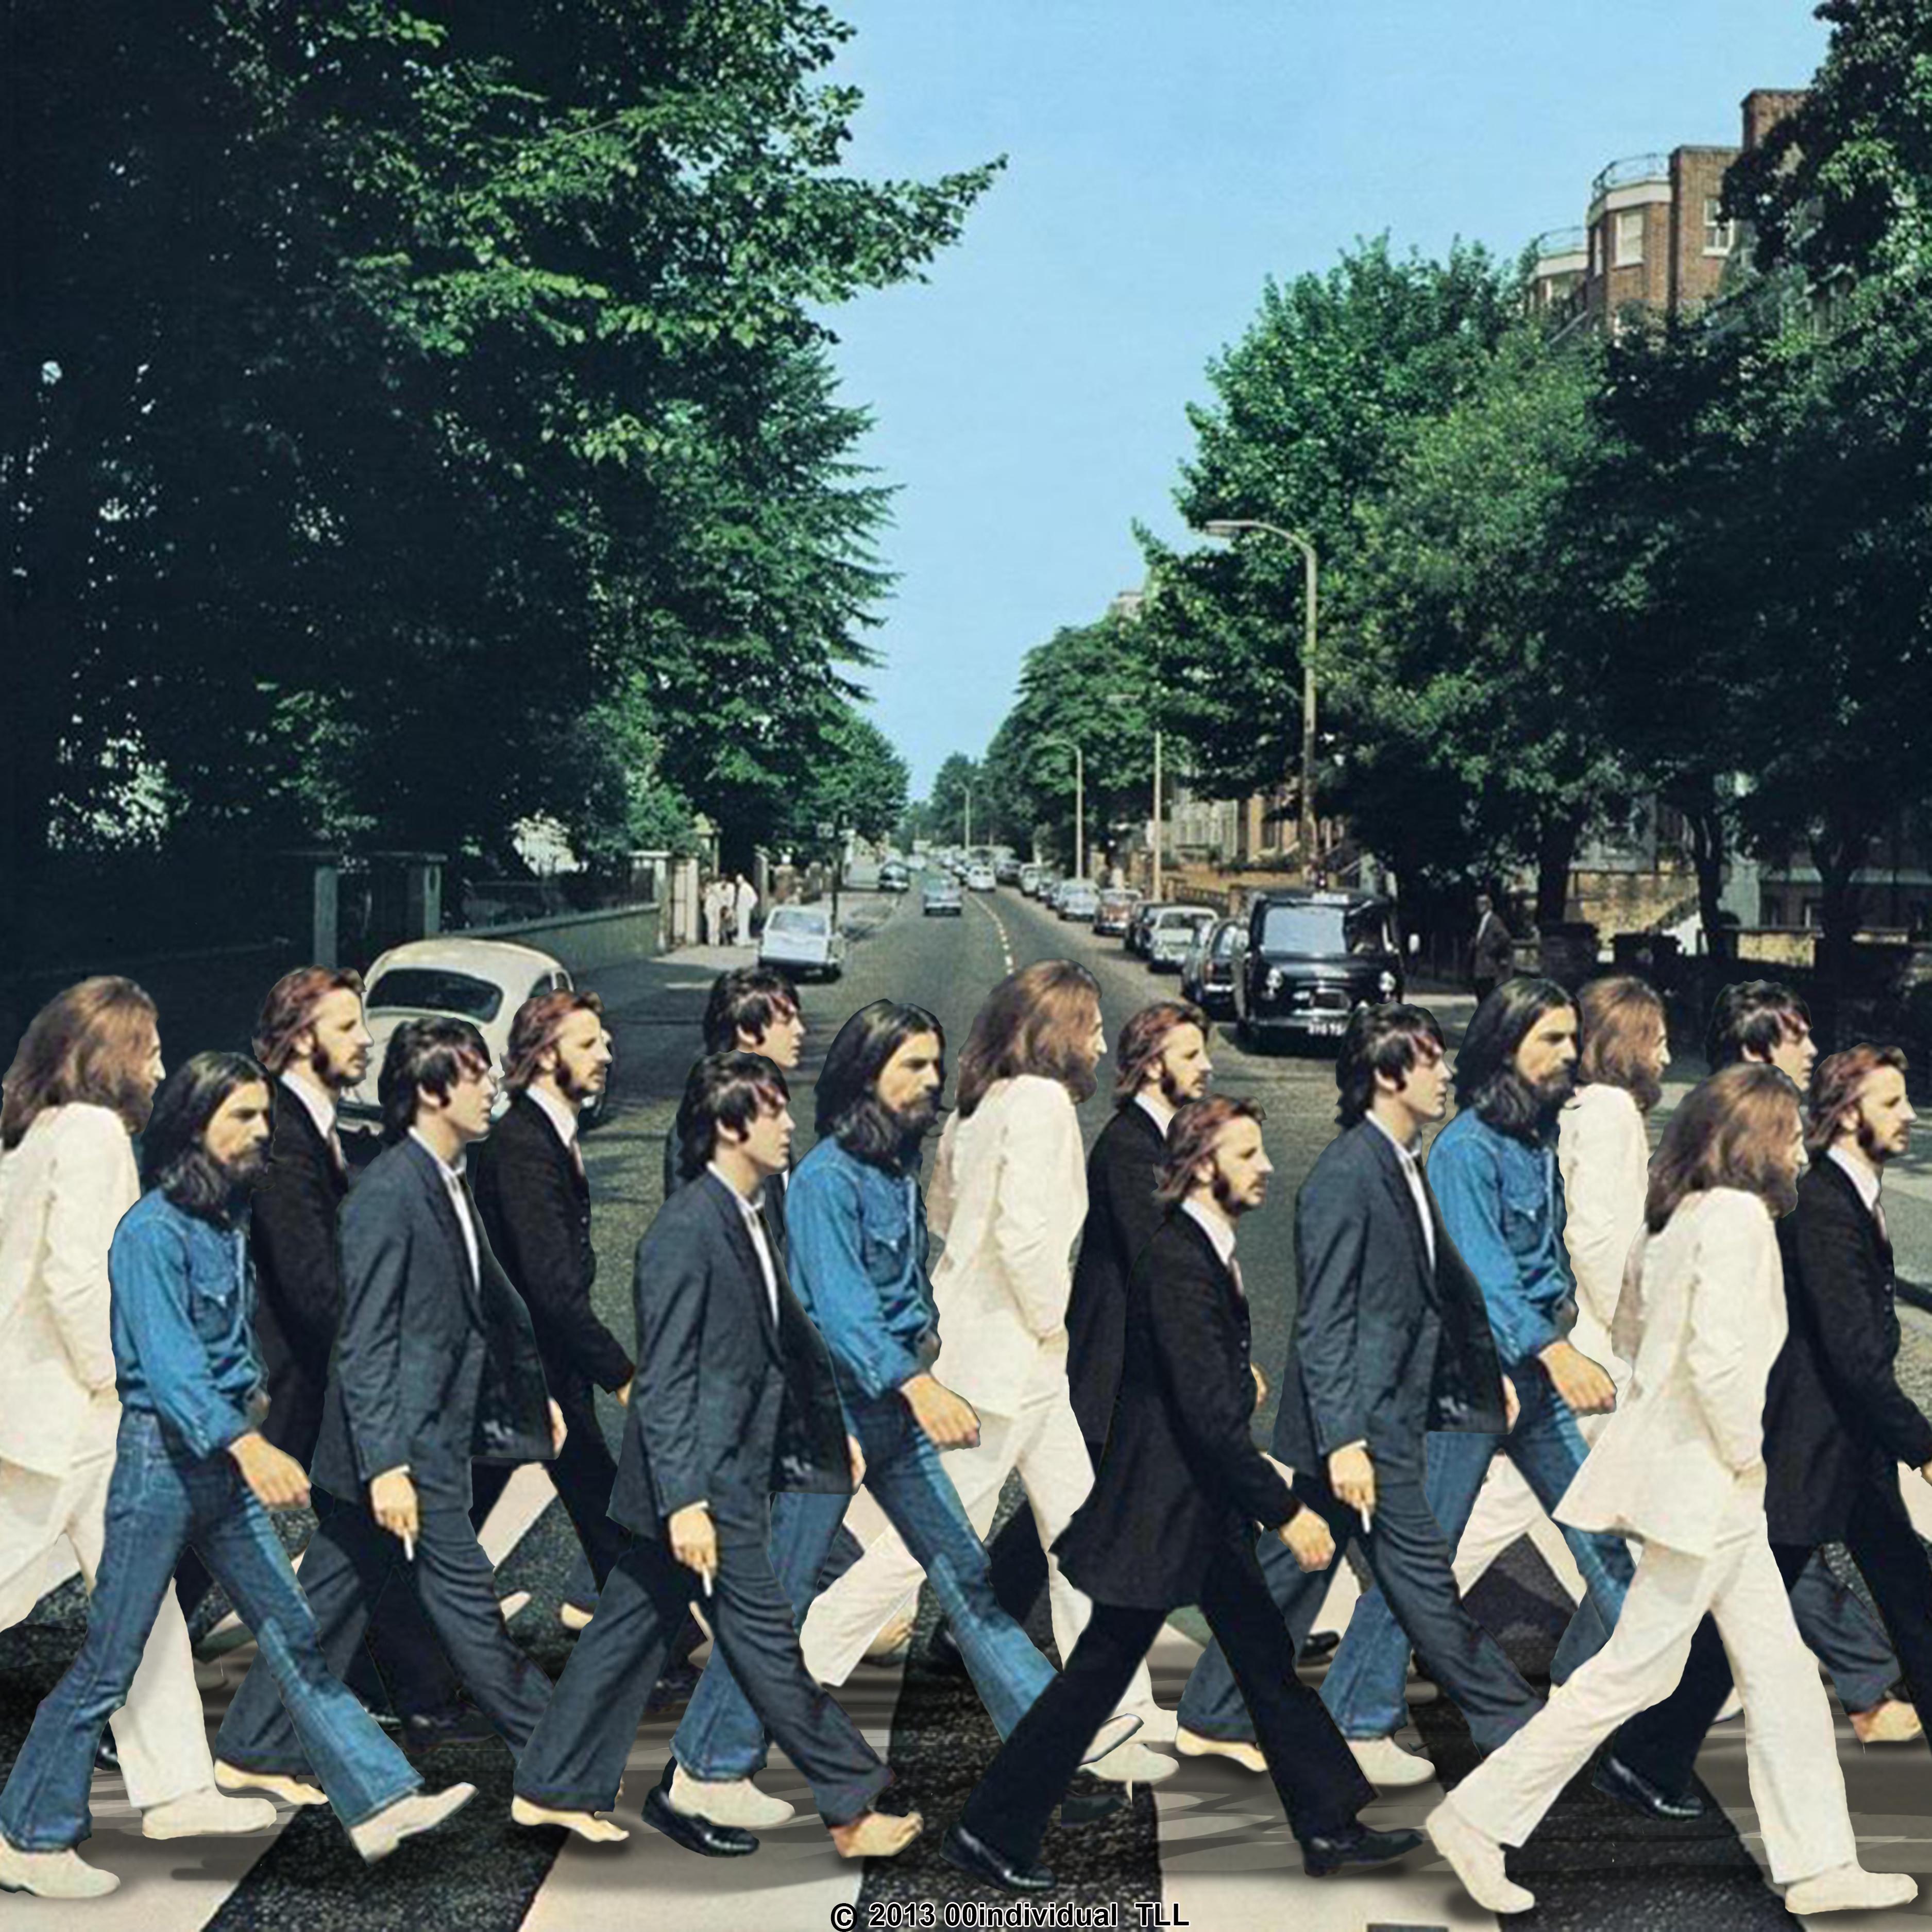 Abbey Road album winter 1969 | 00INDIVIDUAL